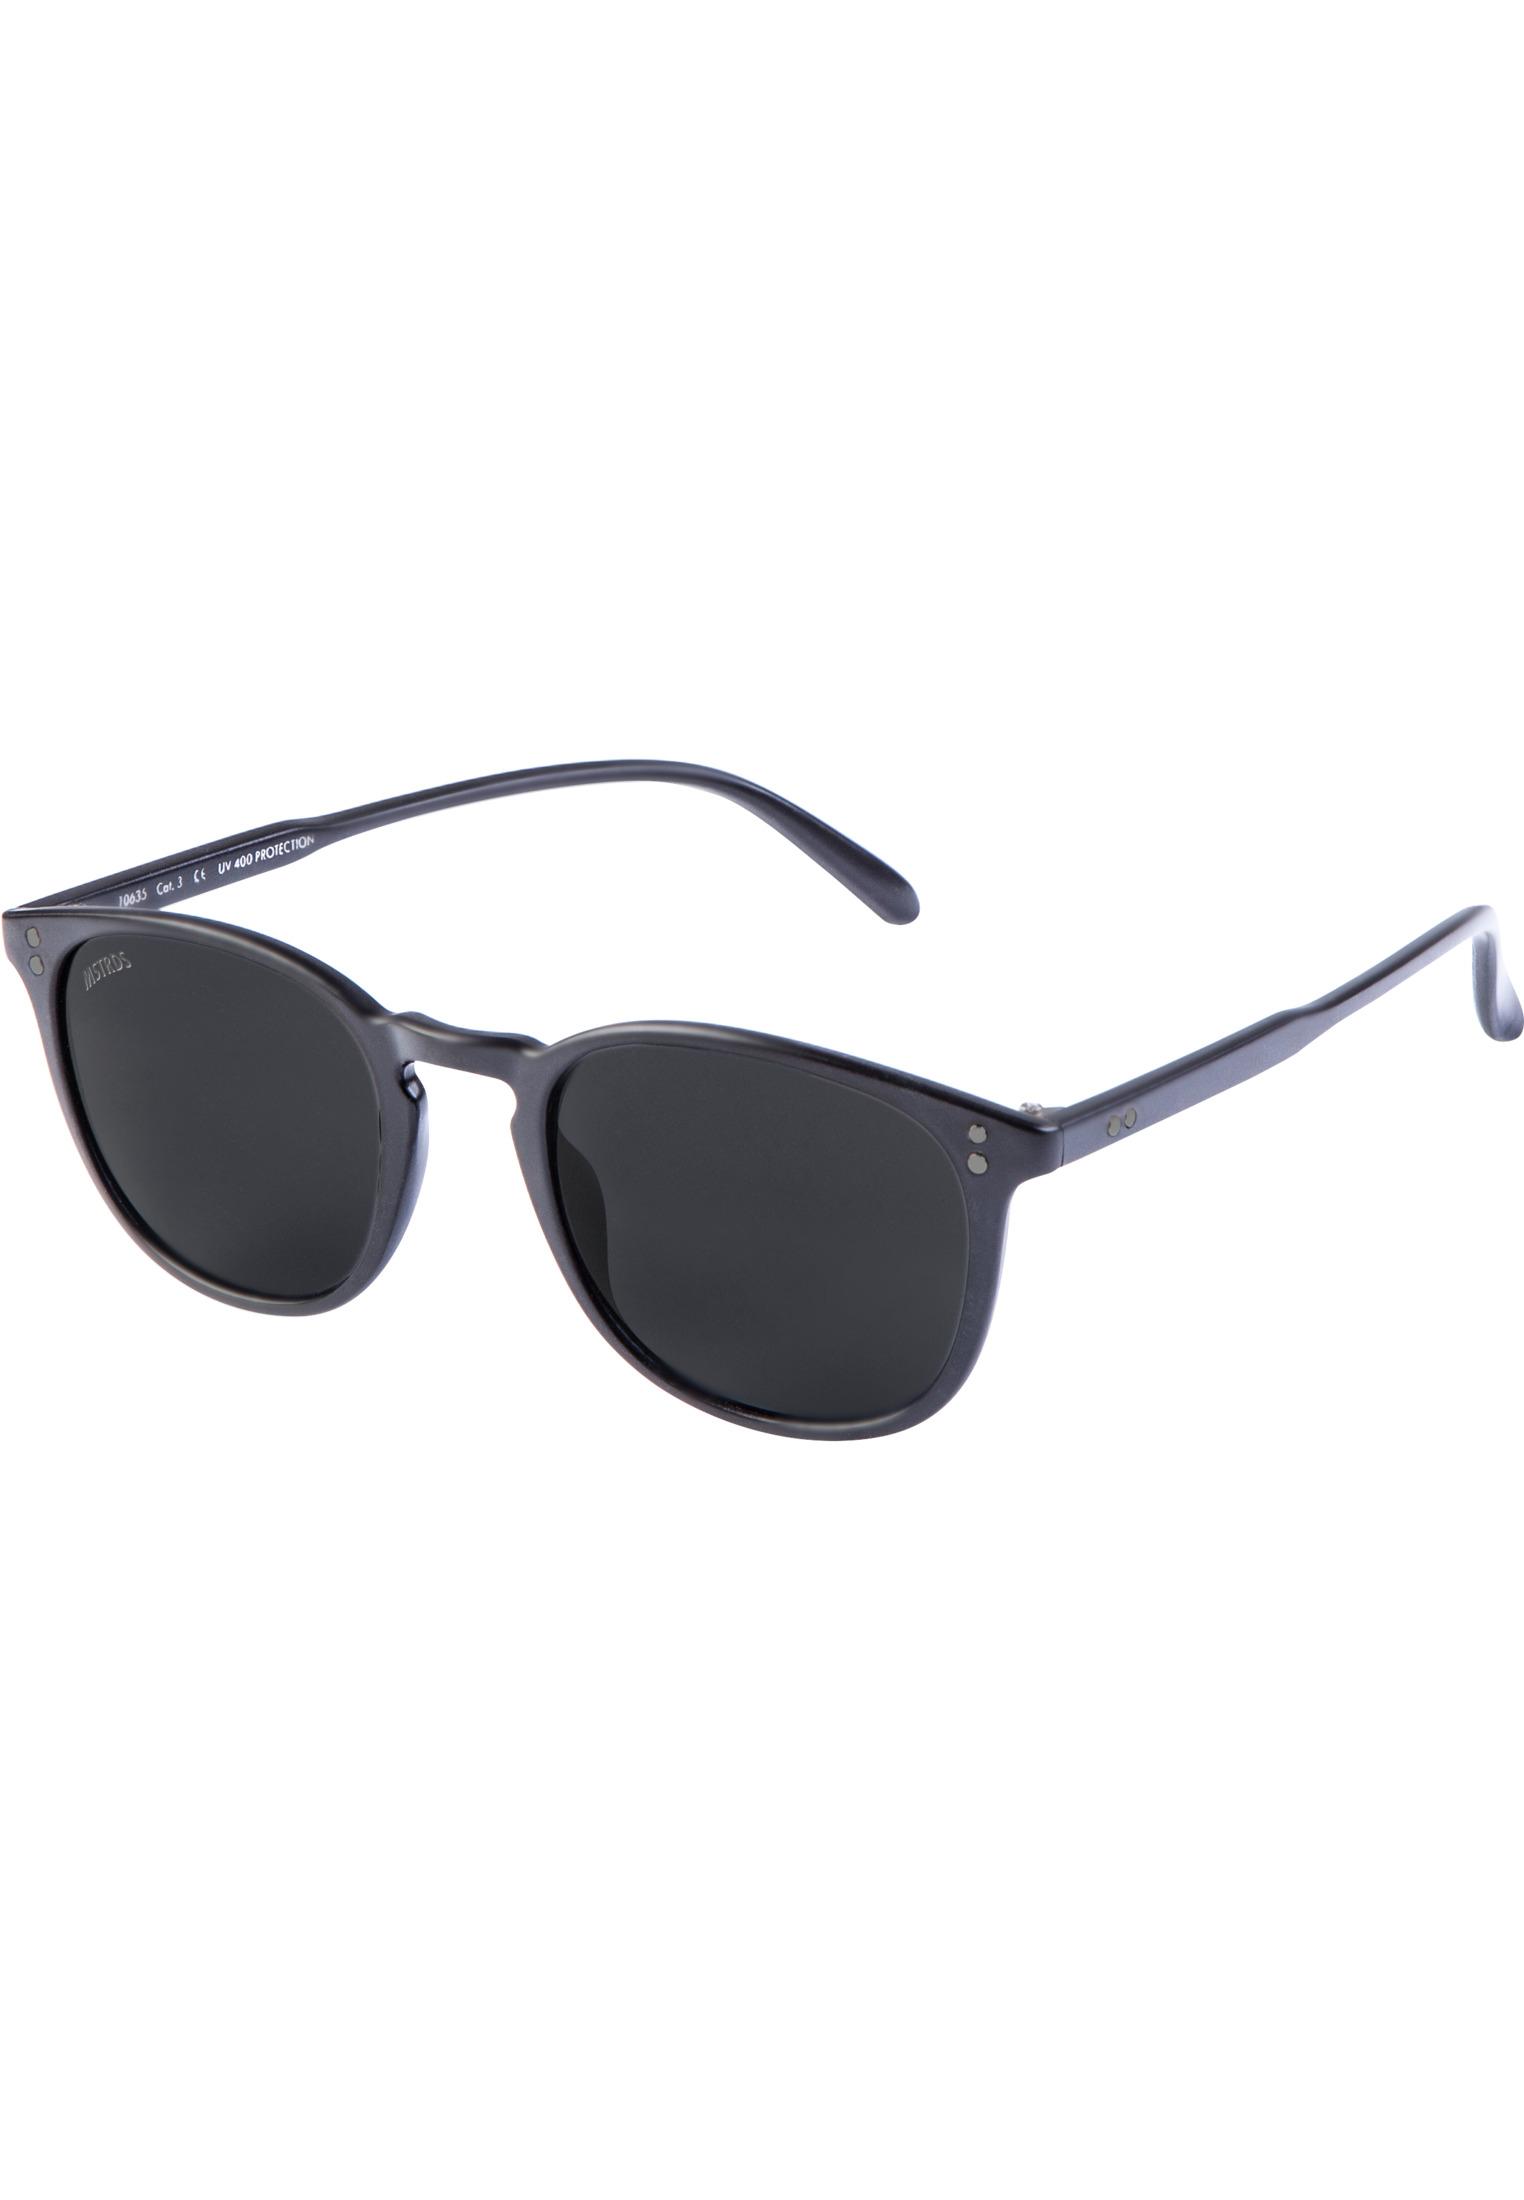 Master Dis Sunglasses Arthur blk/gry - One Size